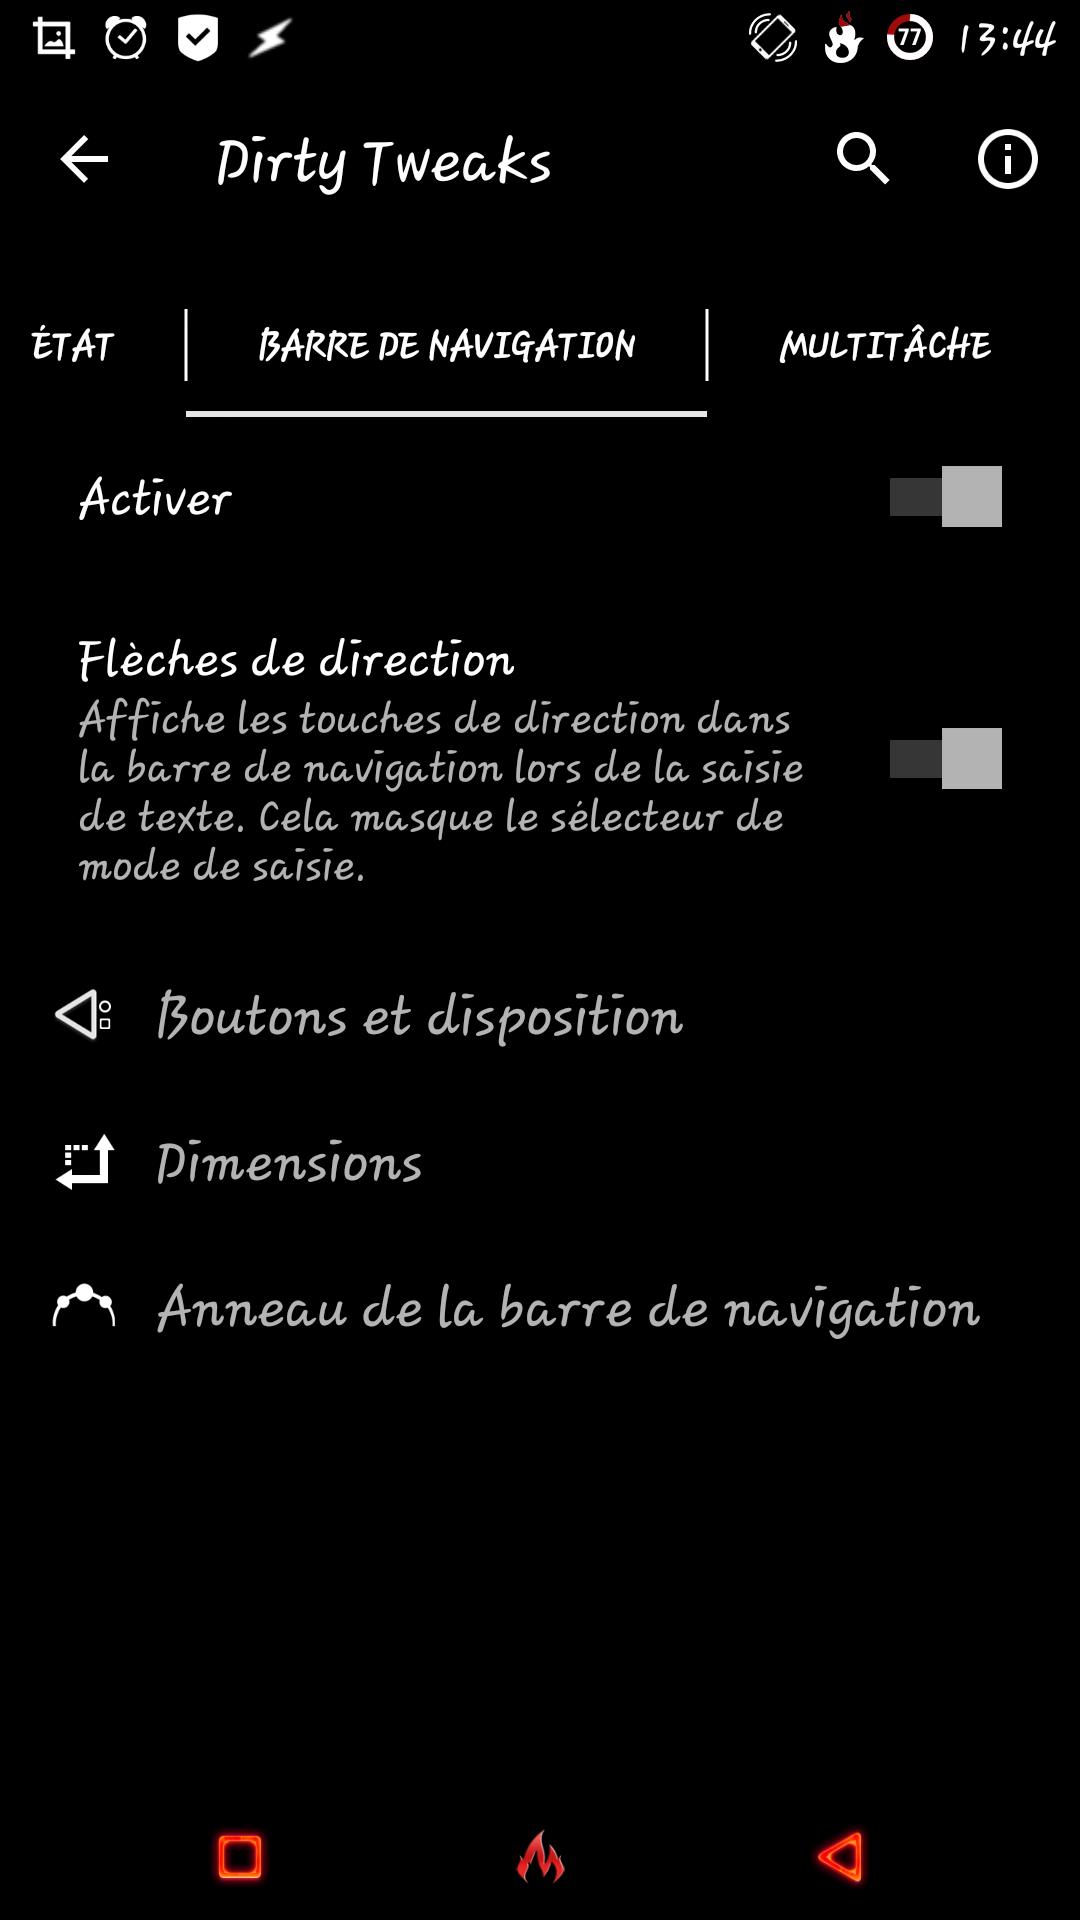 [ROM DU] Dirty Unicorns pour Nexus 5 - Marshmallow 14298245766035